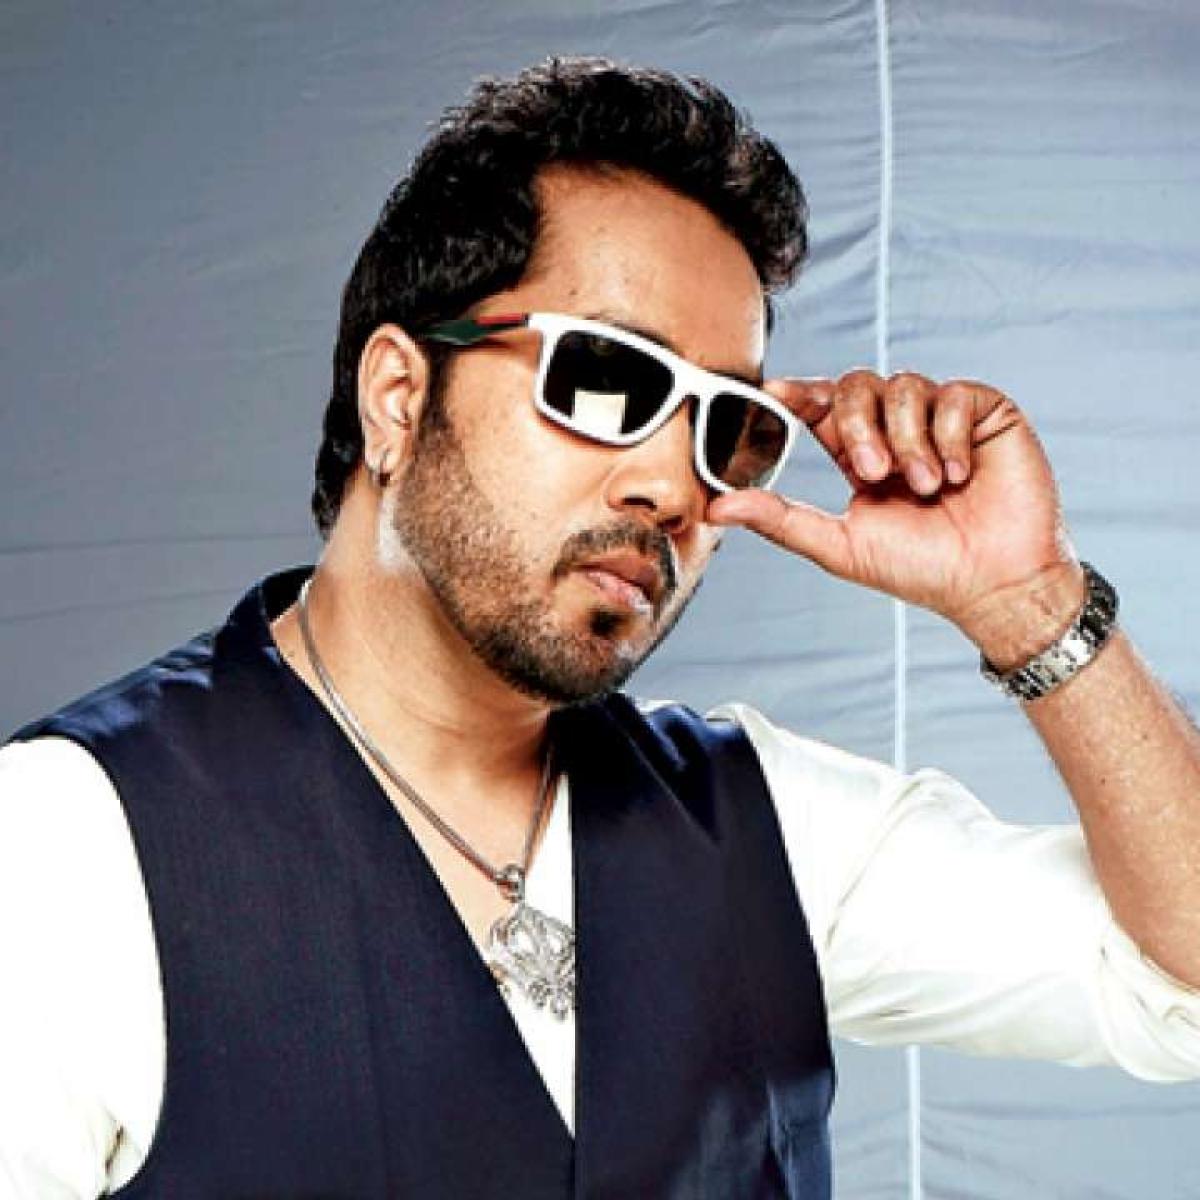 Cine Workers Association bans Mika Singh post-performance in Karachi, Pakistan